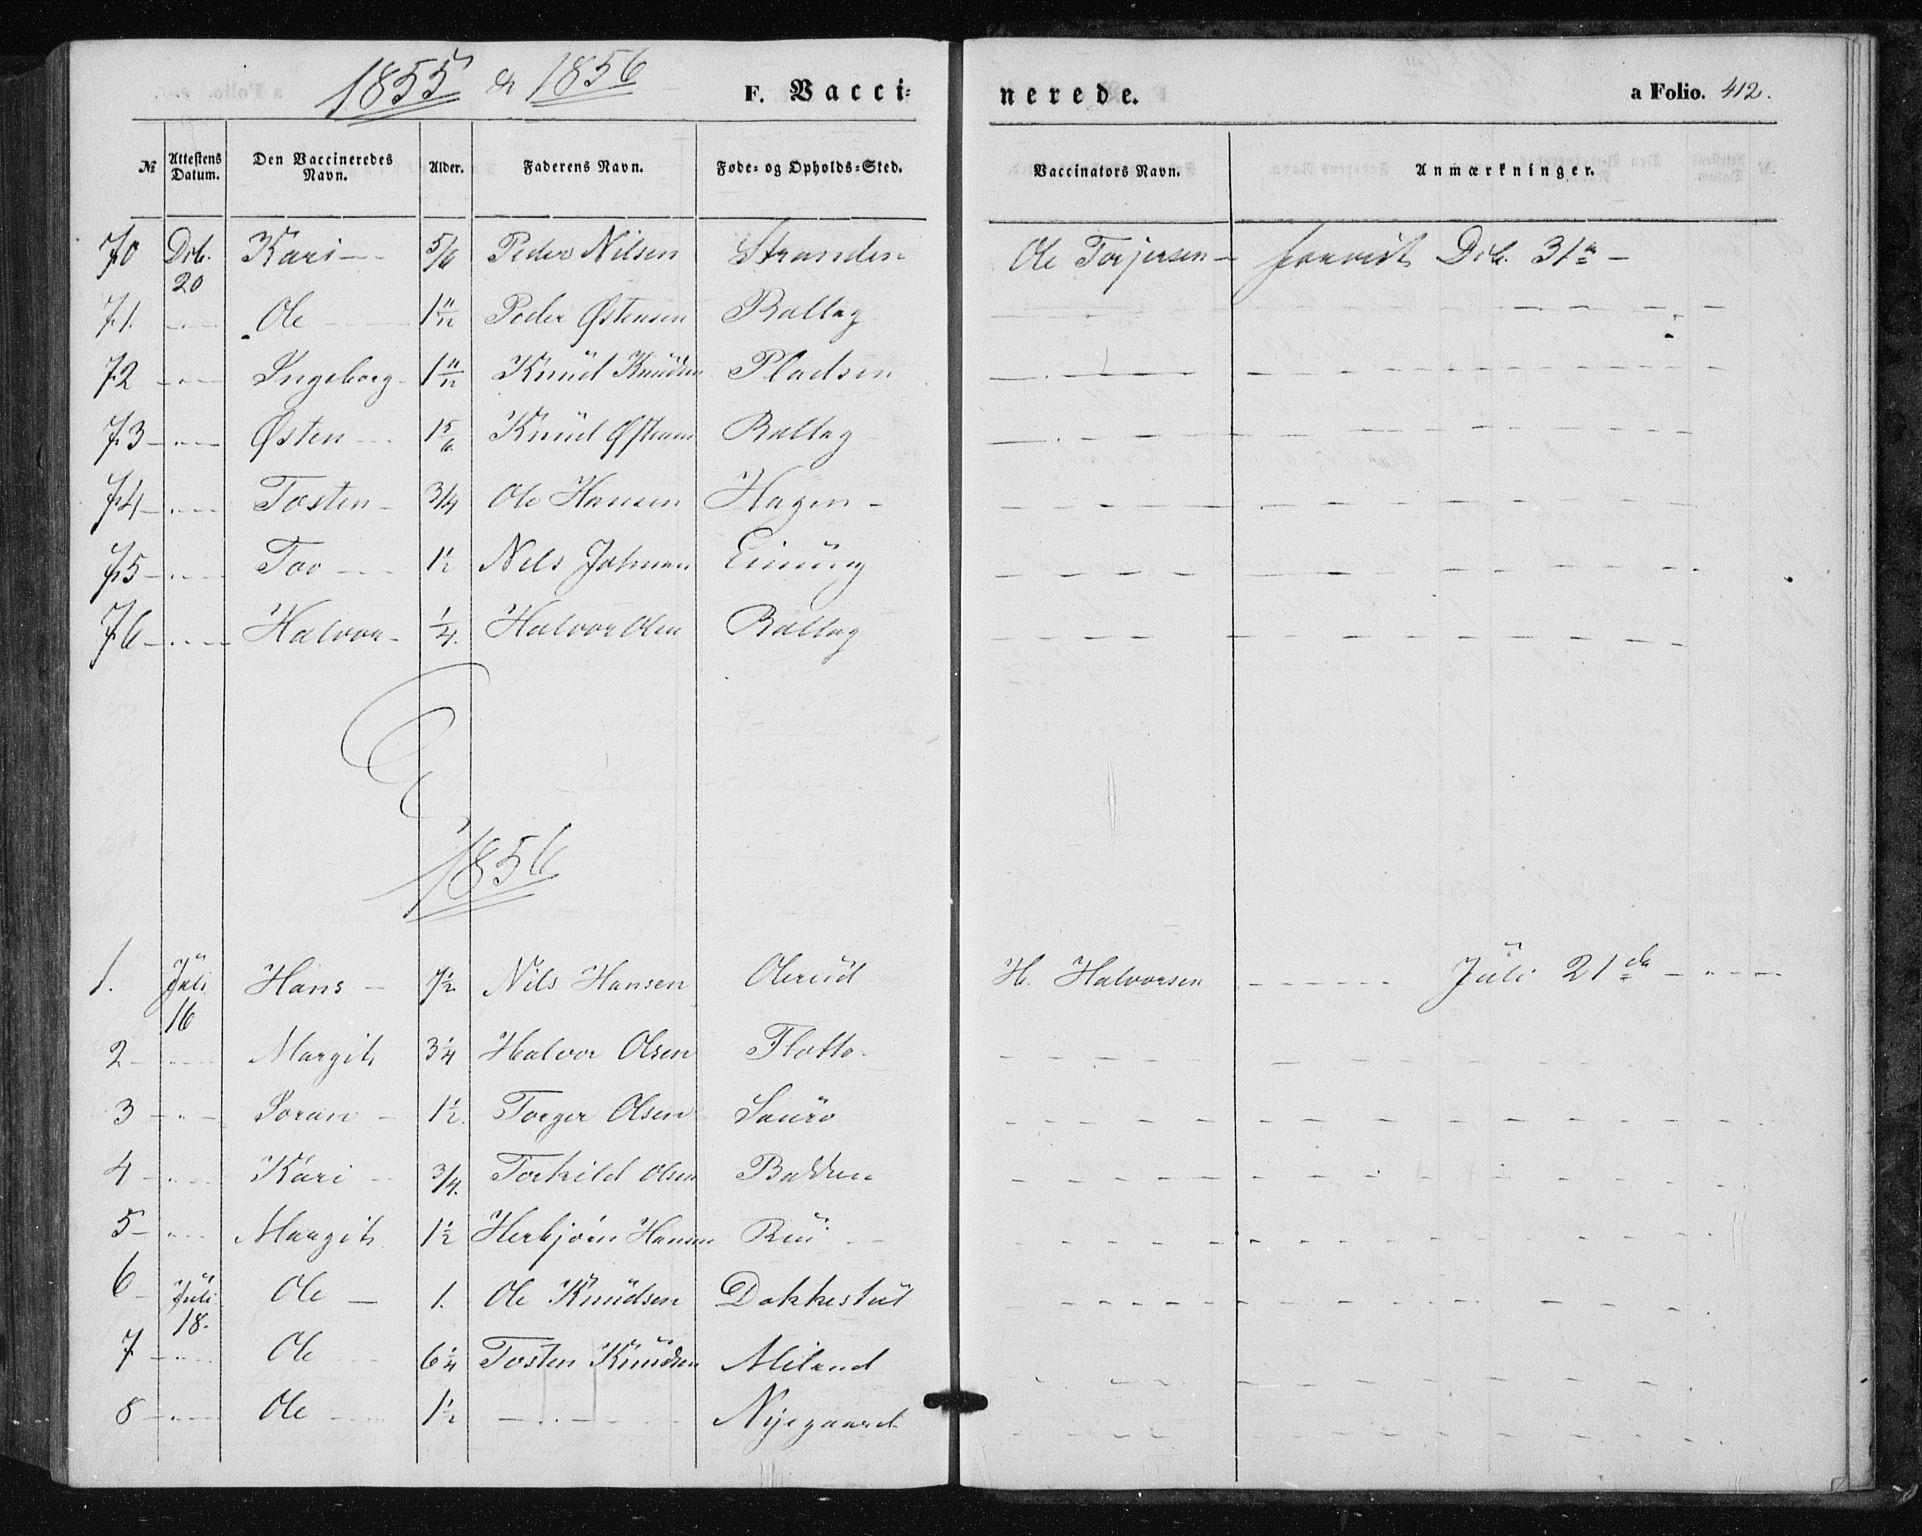 SAKO, Tinn kirkebøker, F/Fa/L0005: Ministerialbok nr. I 5, 1844-1856, s. 412